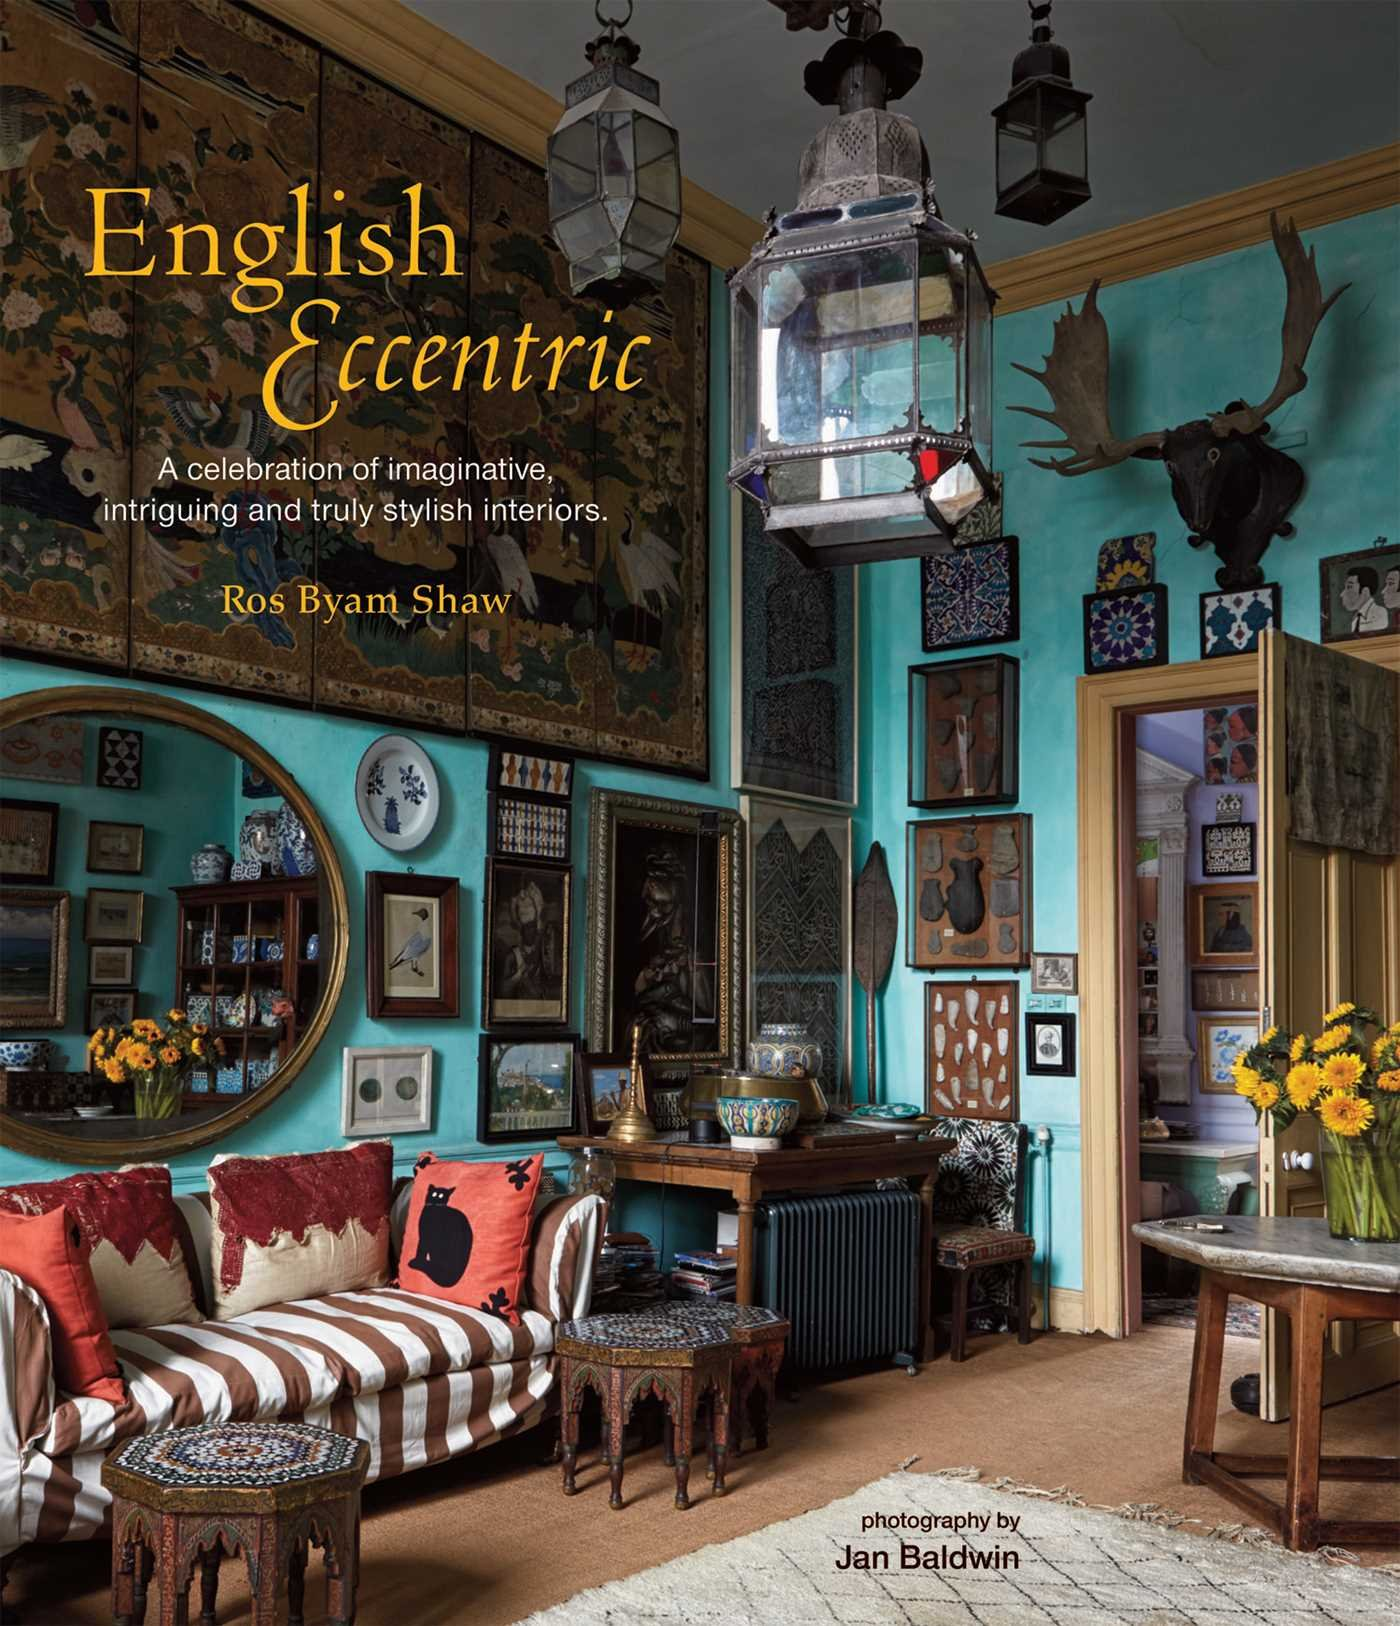 english eccentric a celebration of imaginative intriguing and